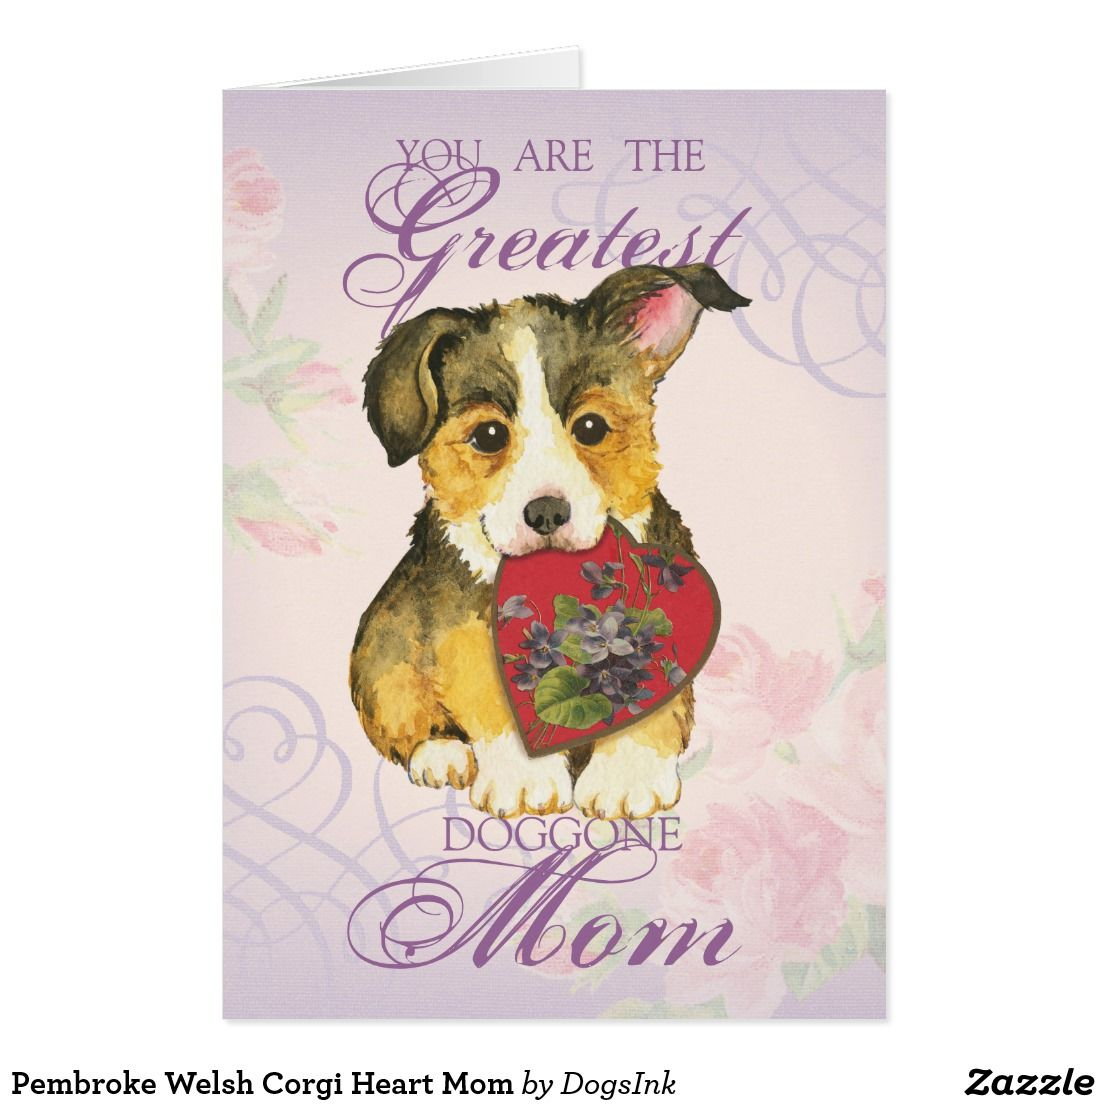 Pembroke Welsh Corgi Heart Mom Card | CORGI Clipart | Pinterest ...